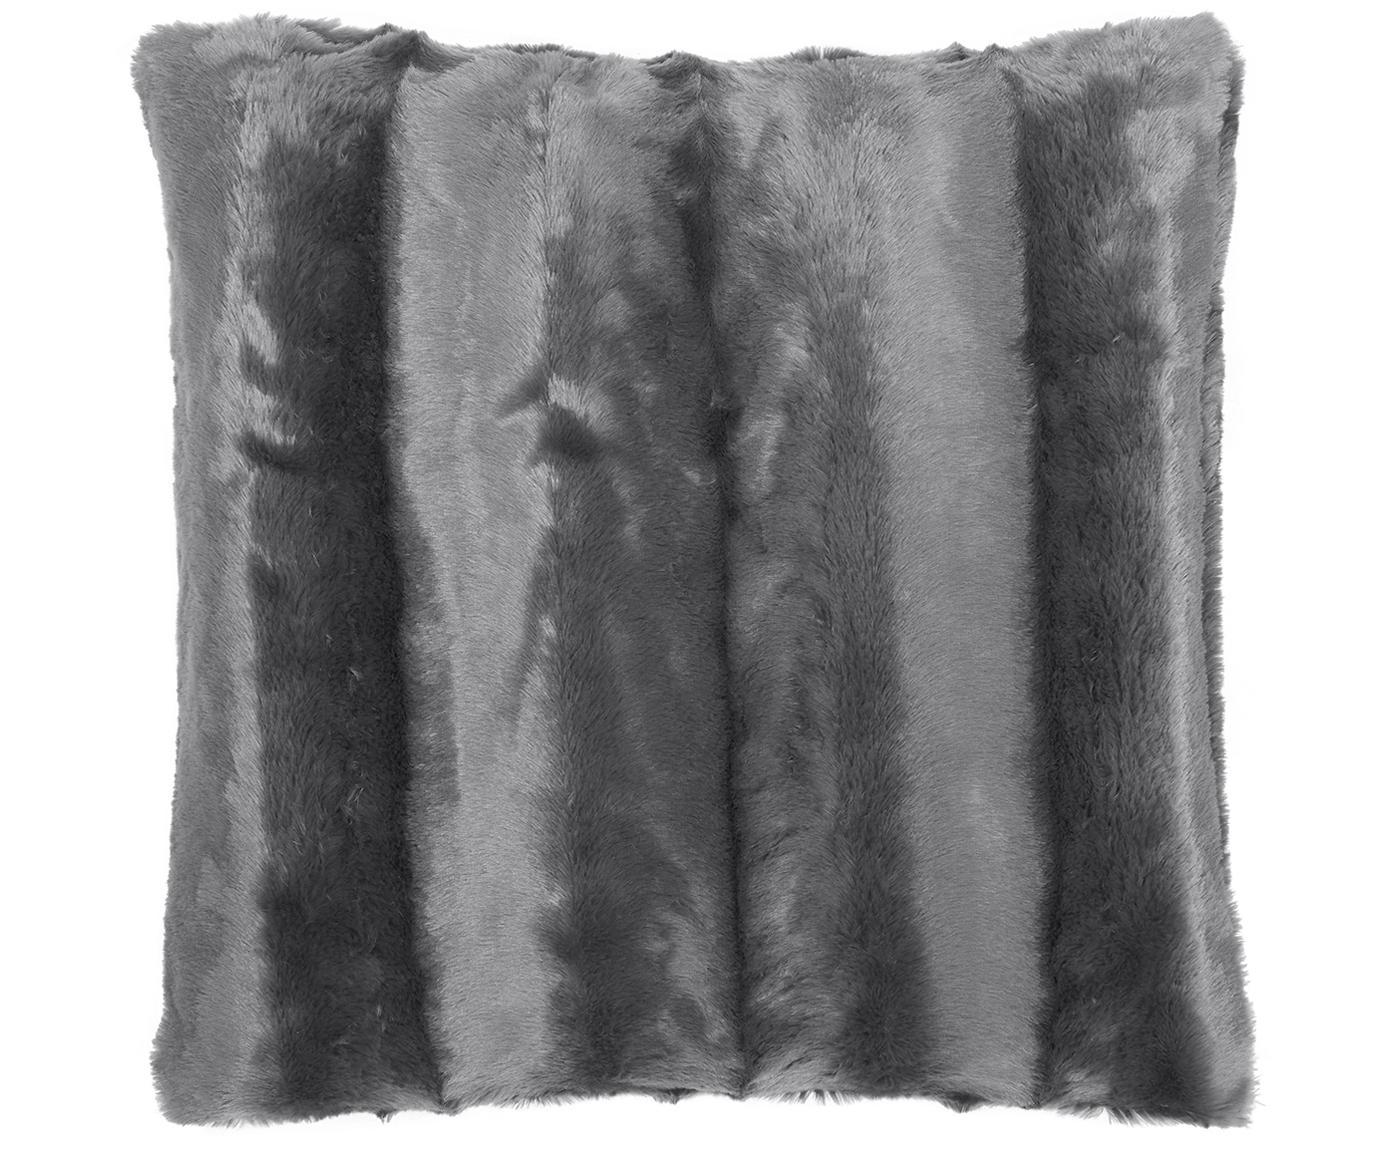 Federa in ecopelliccia grigio scuro Alva, 100% poliestere (similpelle), Grigio scuro, Larg. 45 x Lung. 45 cm